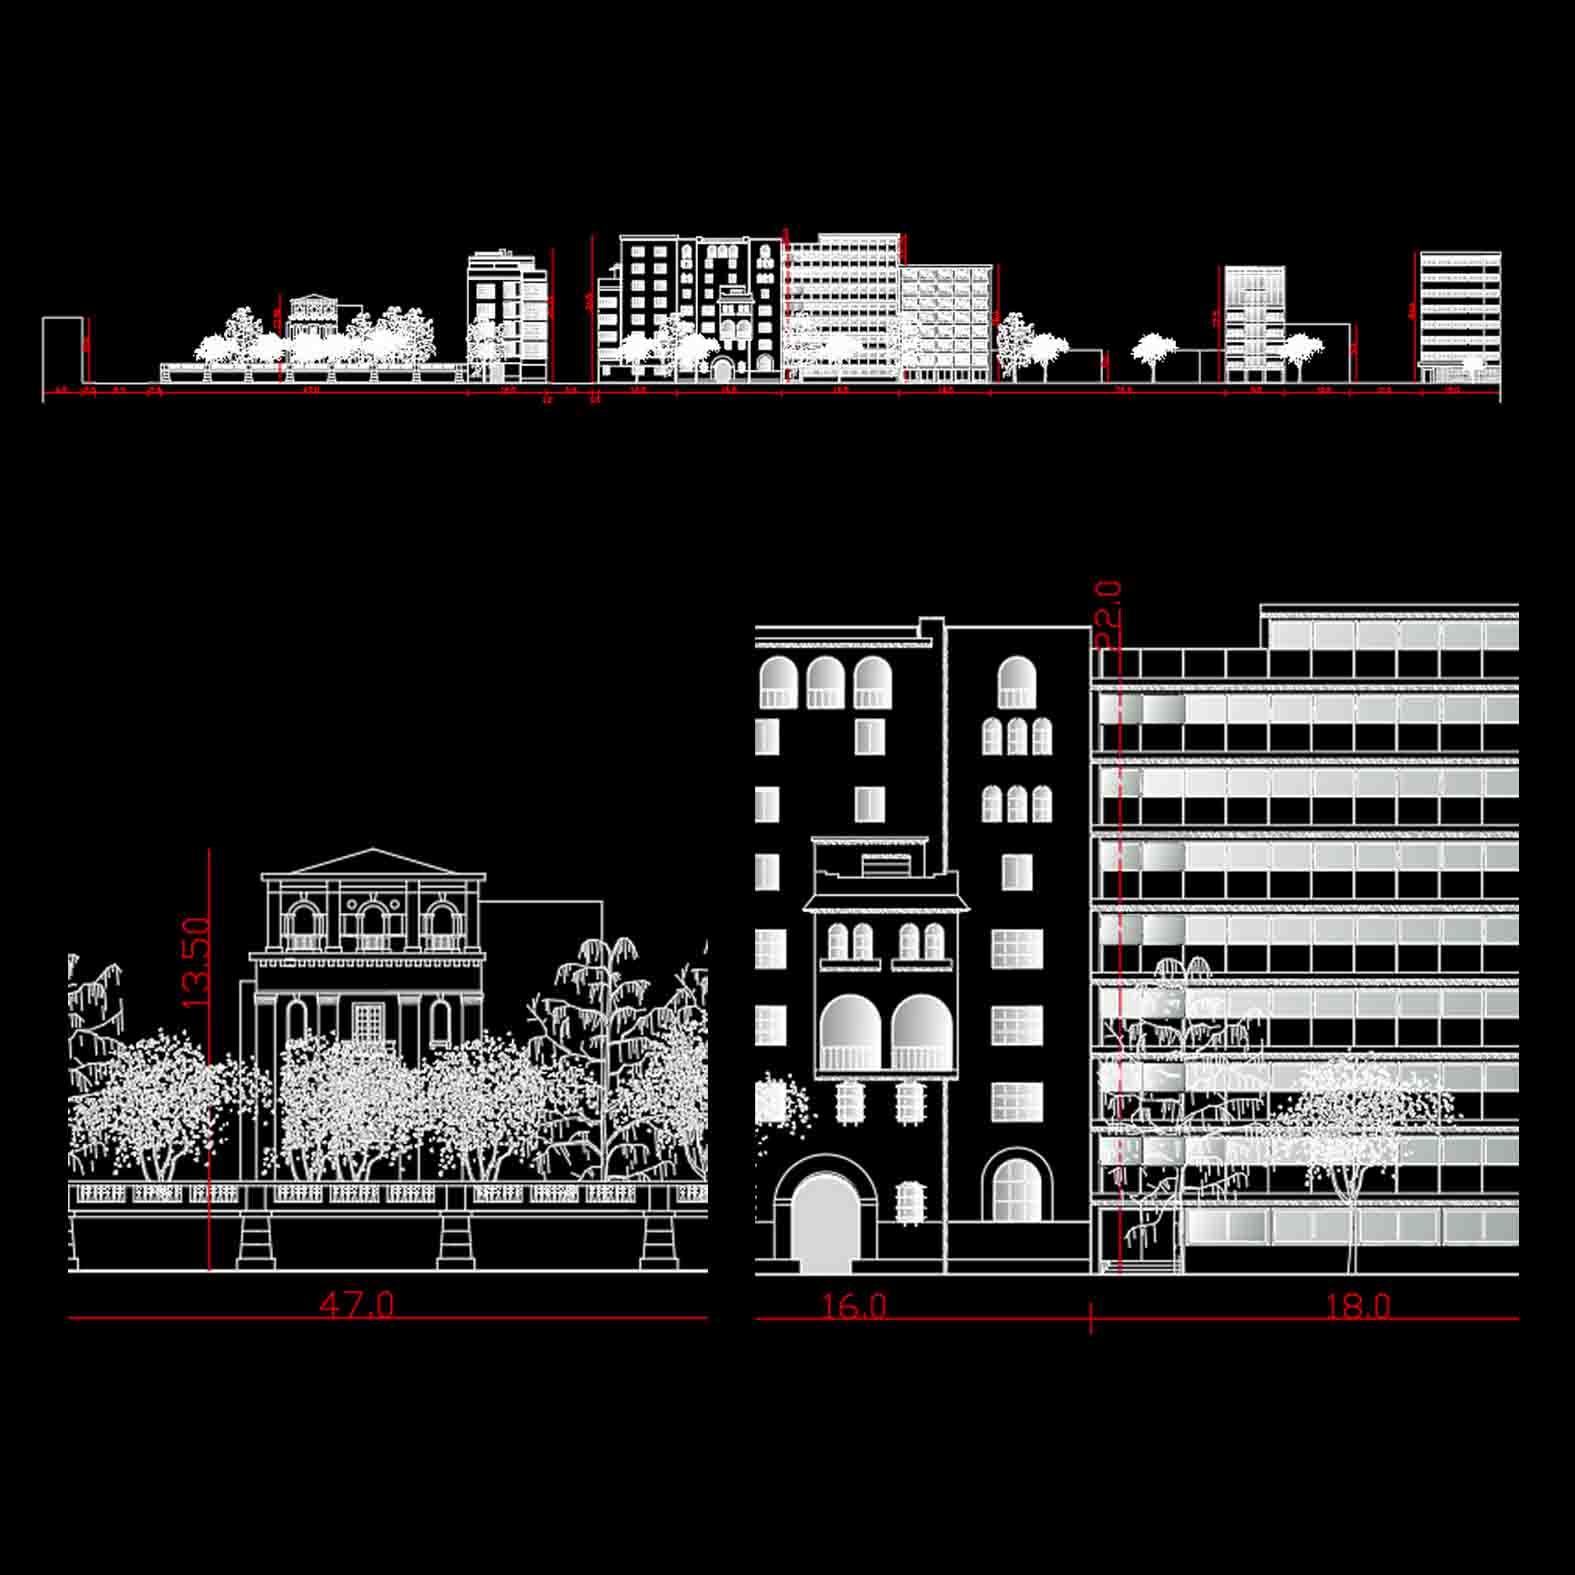 Plano: Elevación Calle Merced / Santiago